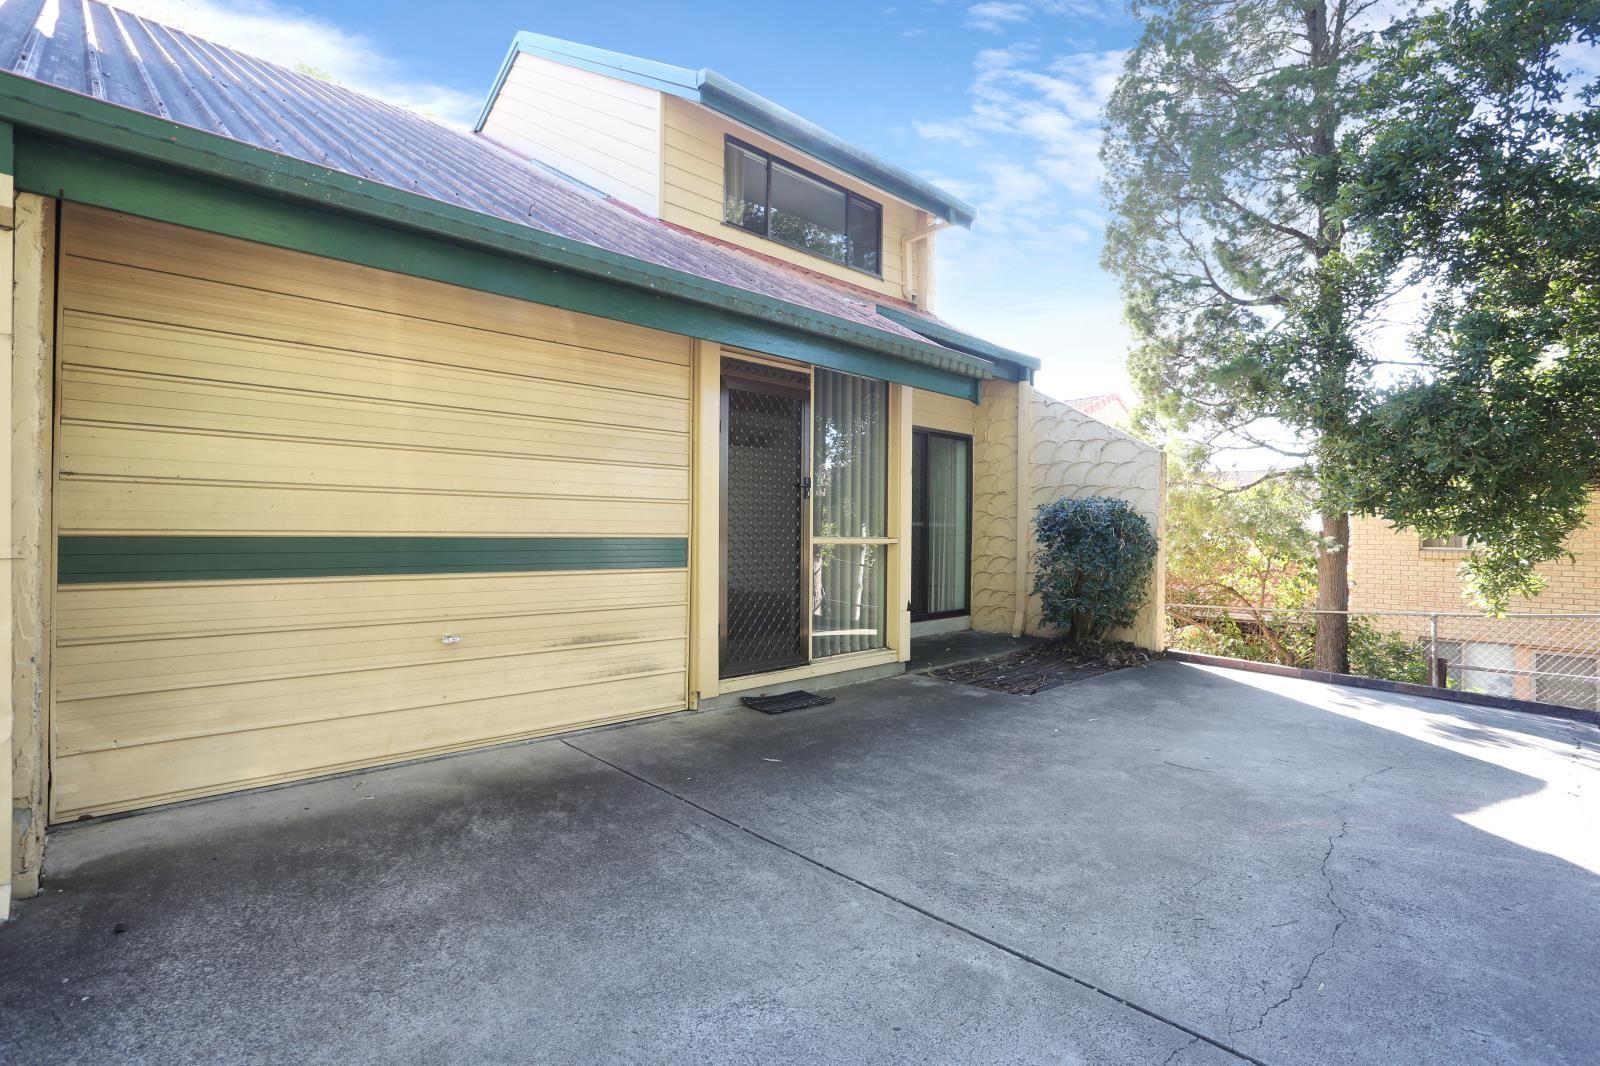 10/65 North Road, Woodridge QLD 4114, Image 1